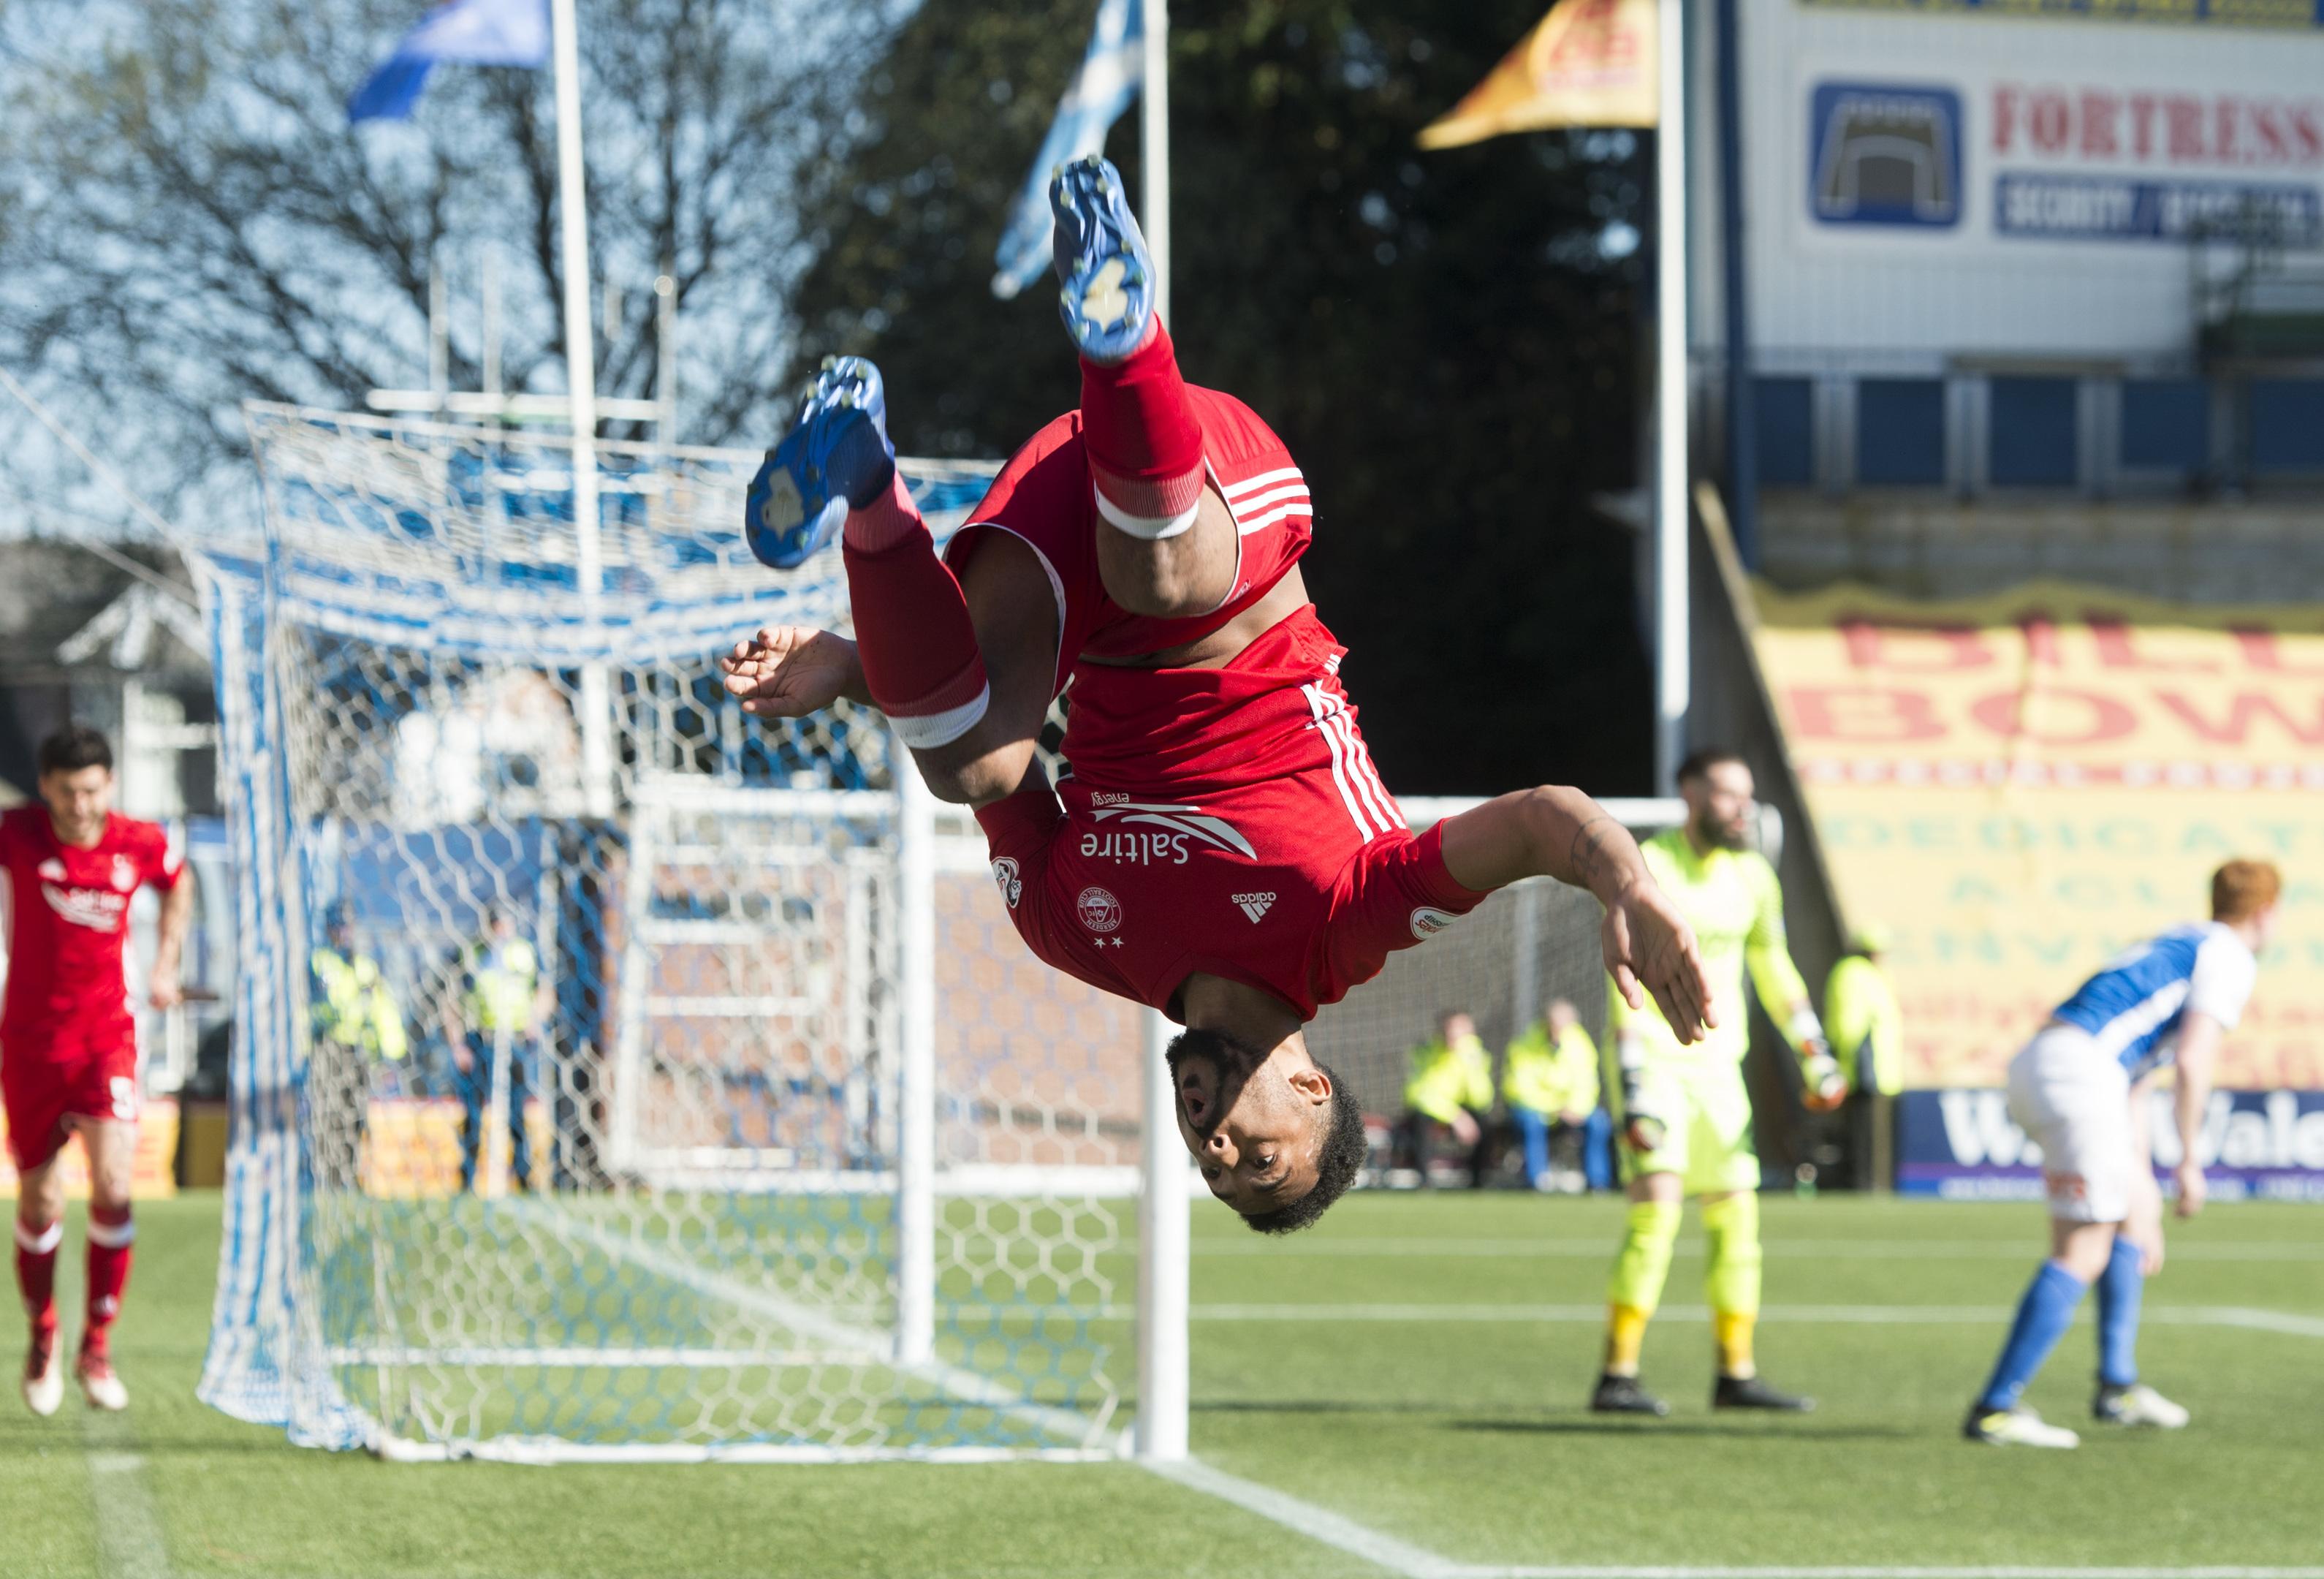 Aberdeen's Shay Logan celebrates making it 2-0 against Kilmarnock.